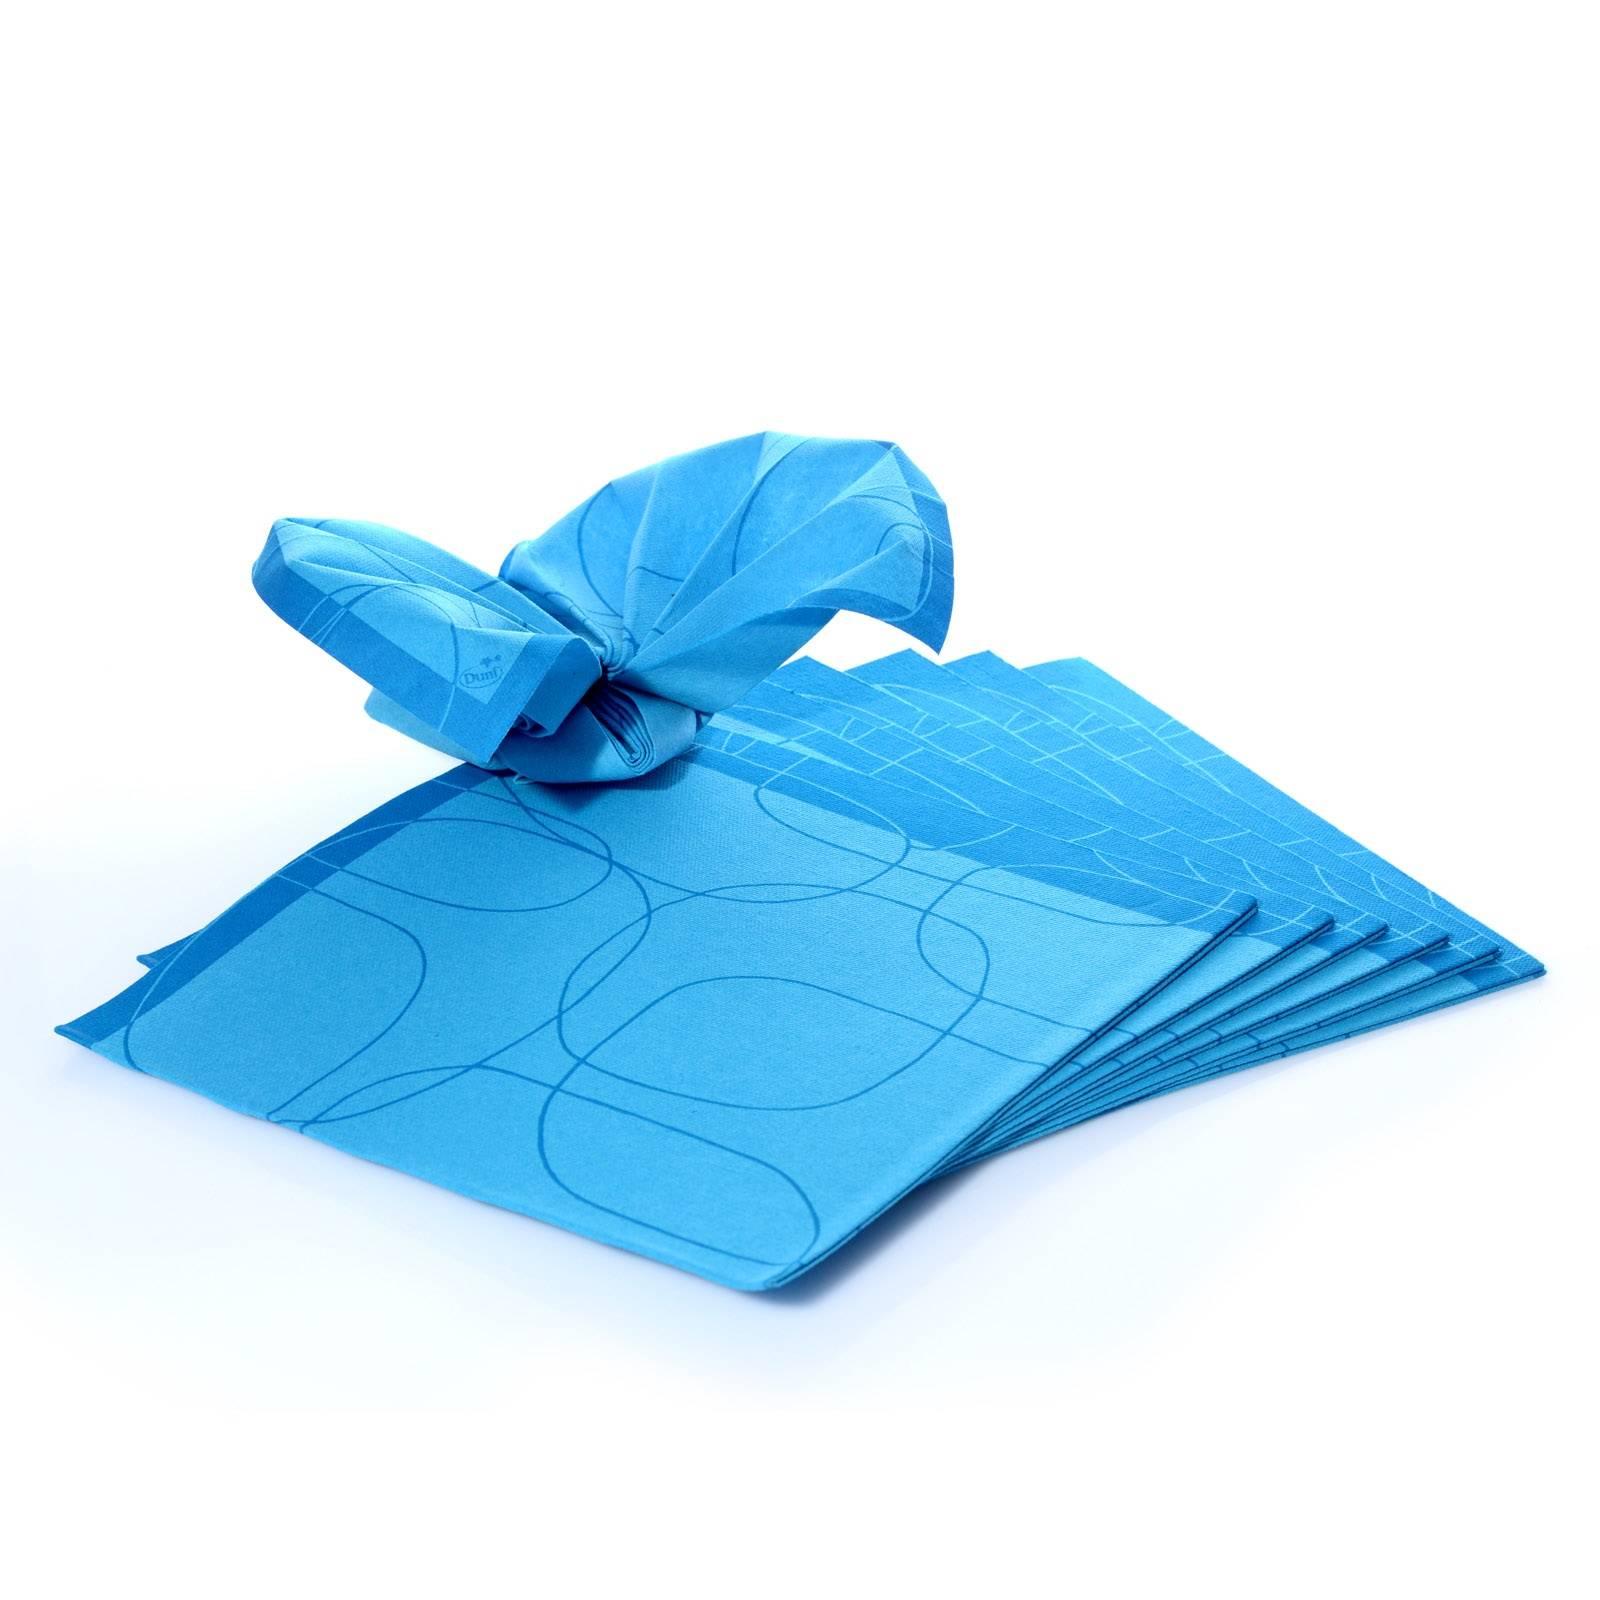 duni servietten 1 4 falz blau muster 40 x 40 cm dunilin 15 stk. Black Bedroom Furniture Sets. Home Design Ideas